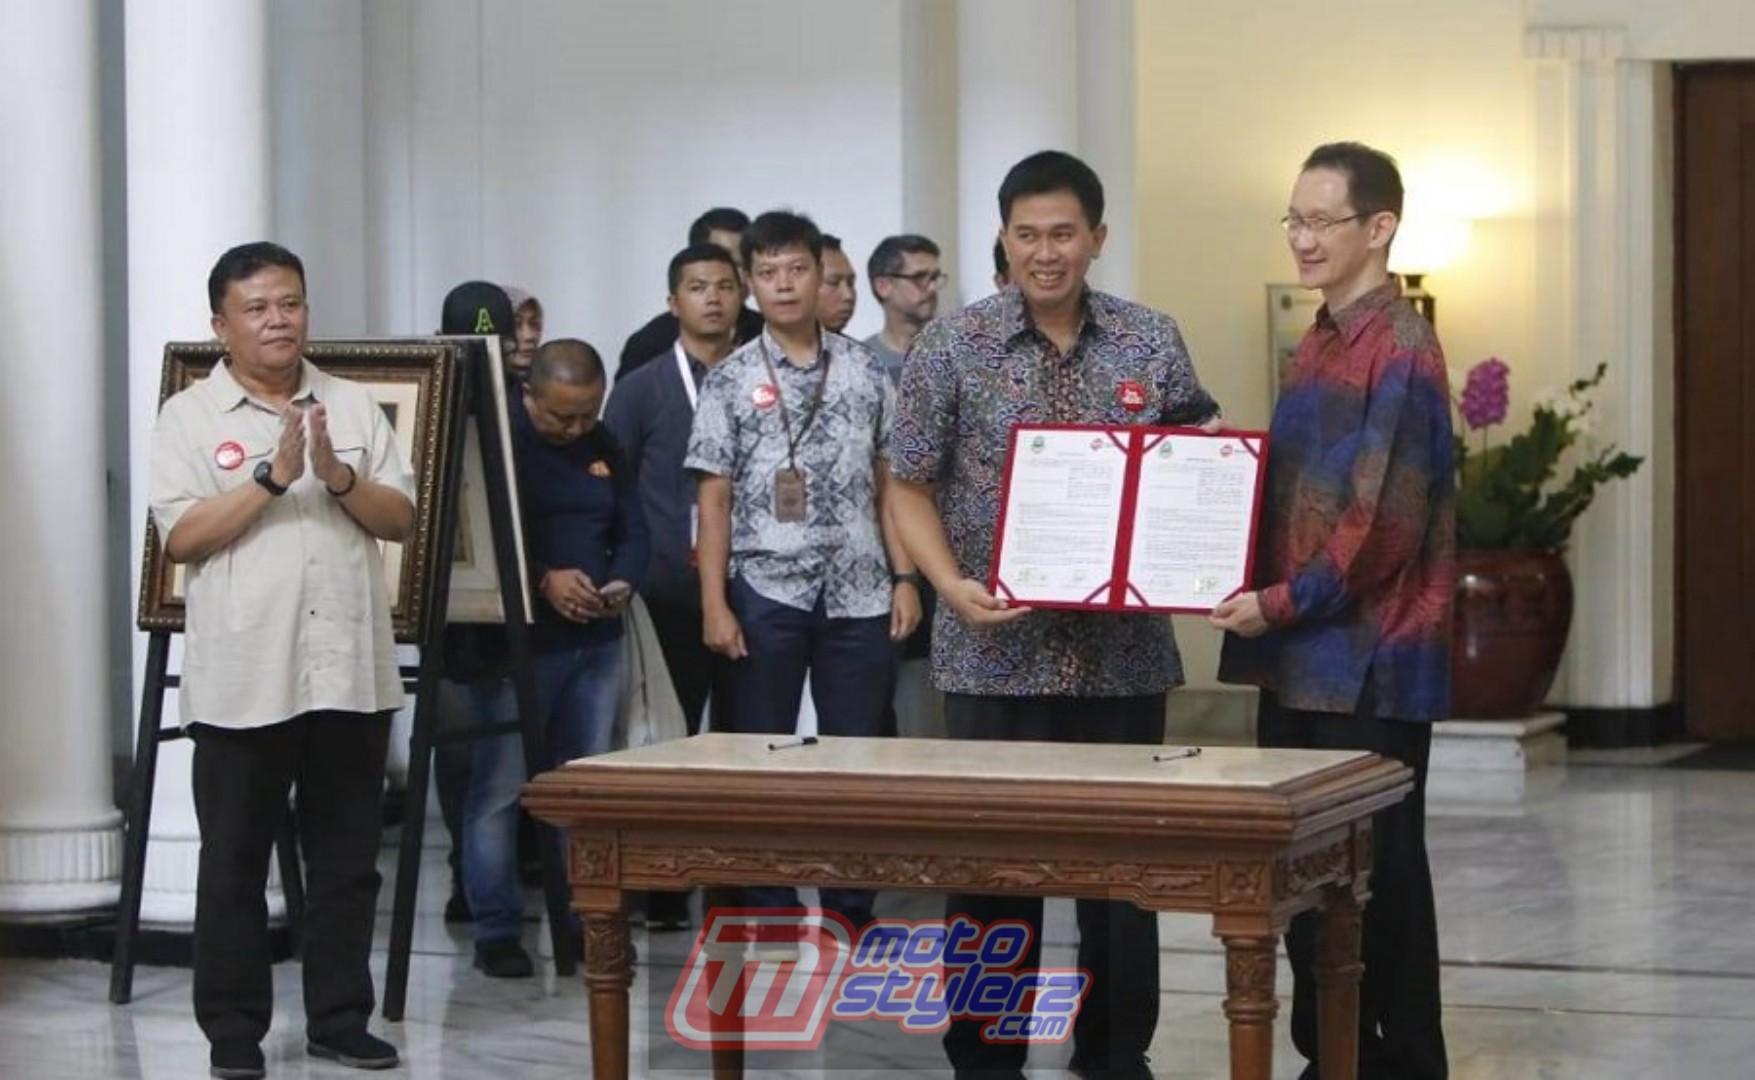 Kerjasama DAM & Pemprov Jabar - Dilakukan Oleh Krisgianto Lilikwarga (Direktur Utama PT. DAM)